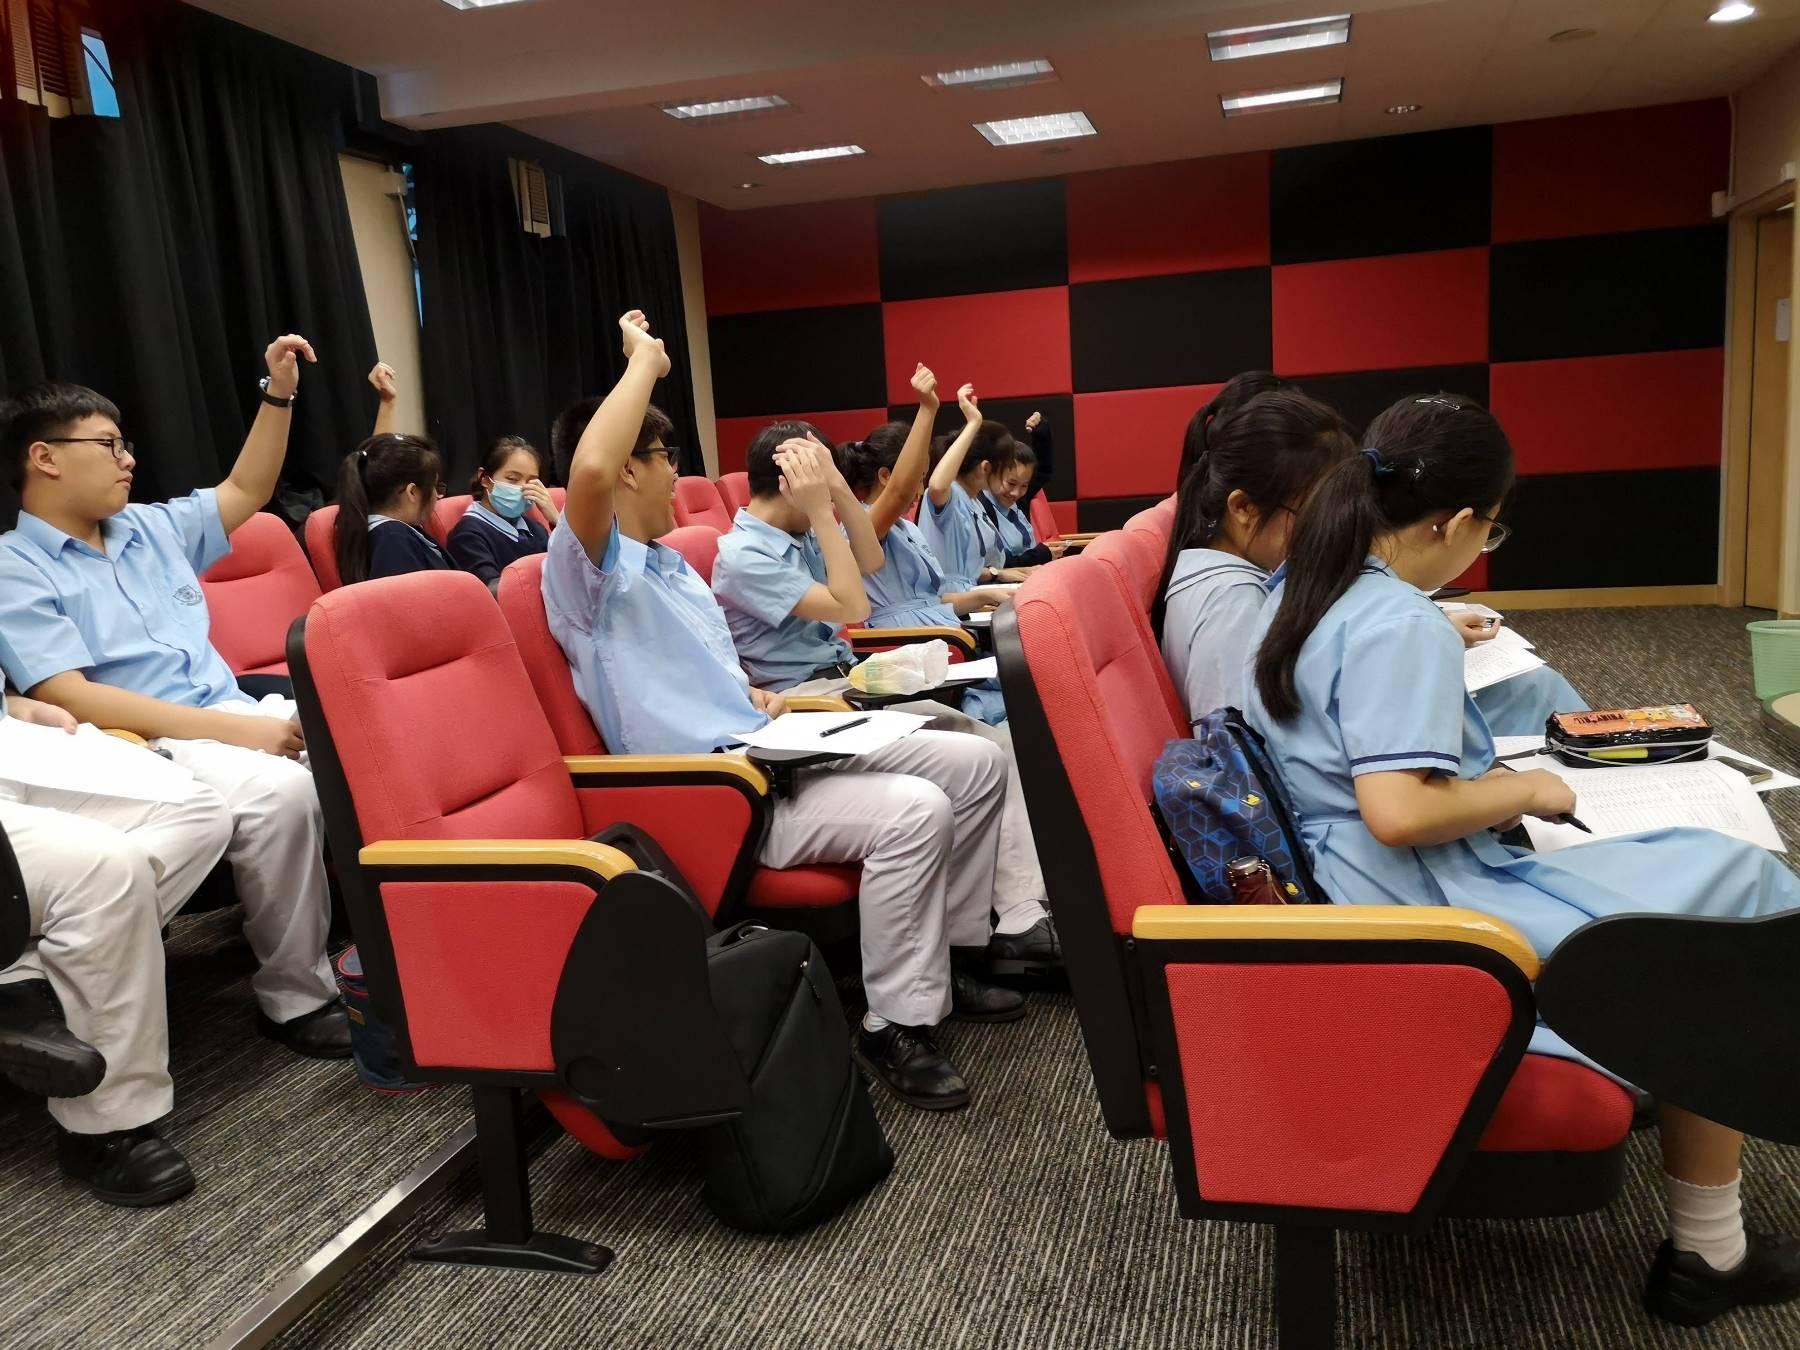 http://npc.edu.hk/sites/default/files/img_20180920_175207.jpg